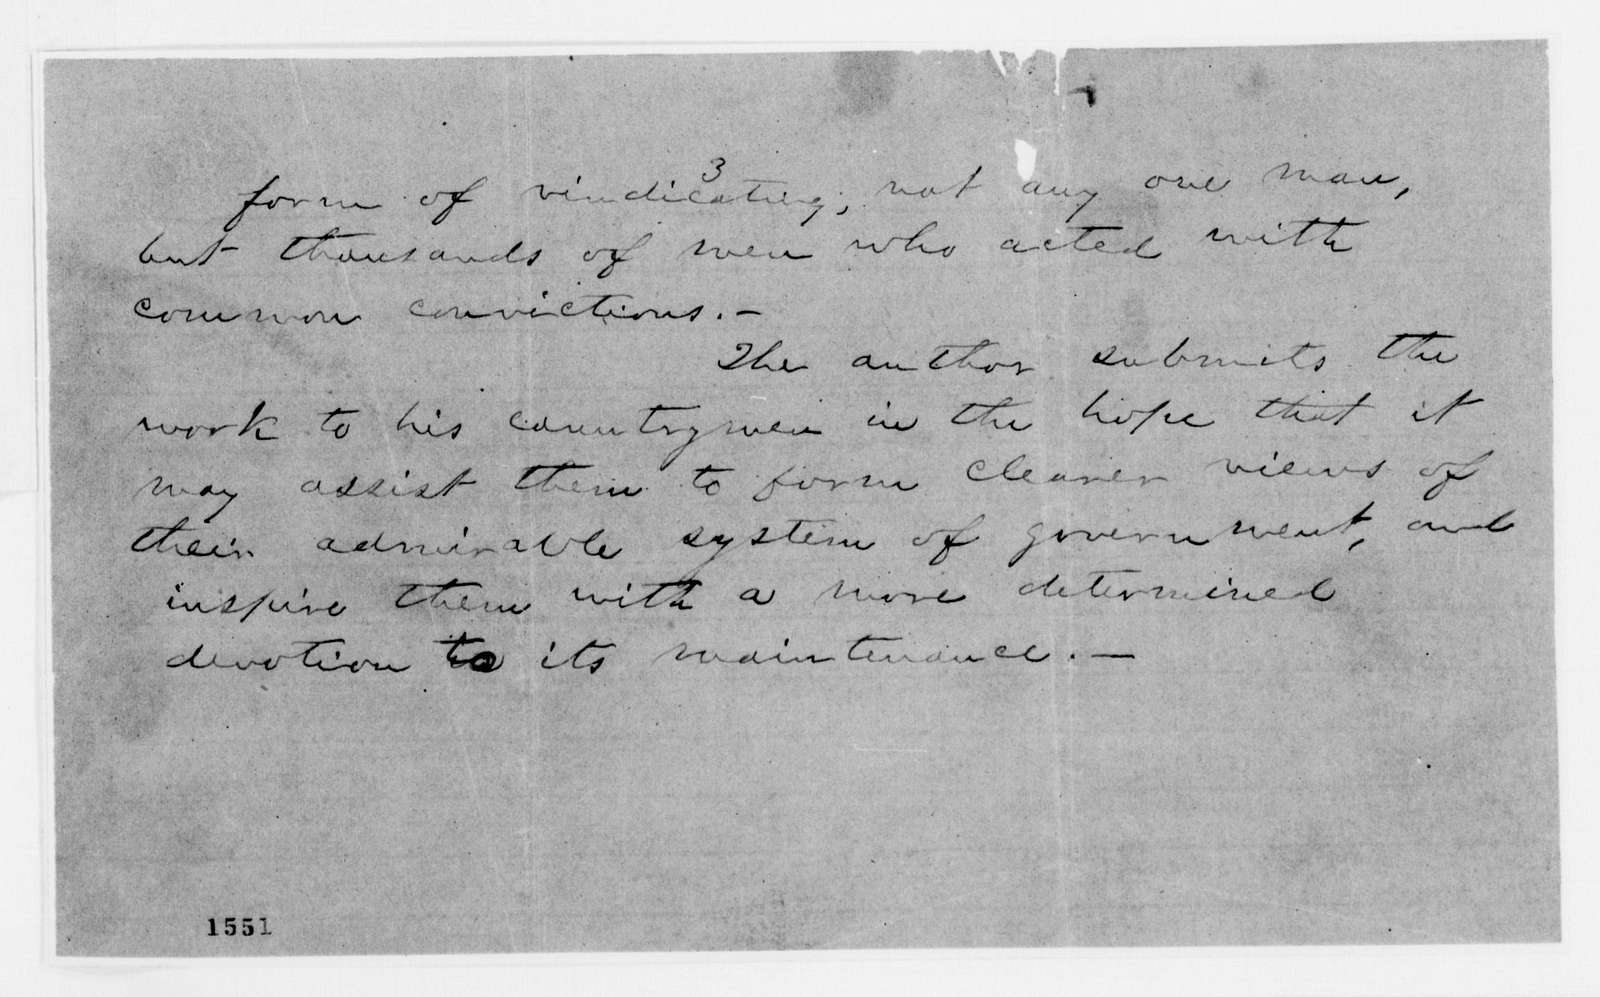 Alexander Hamilton Stephens Papers: General Correspondence, 1784-1886; Miscellaneous